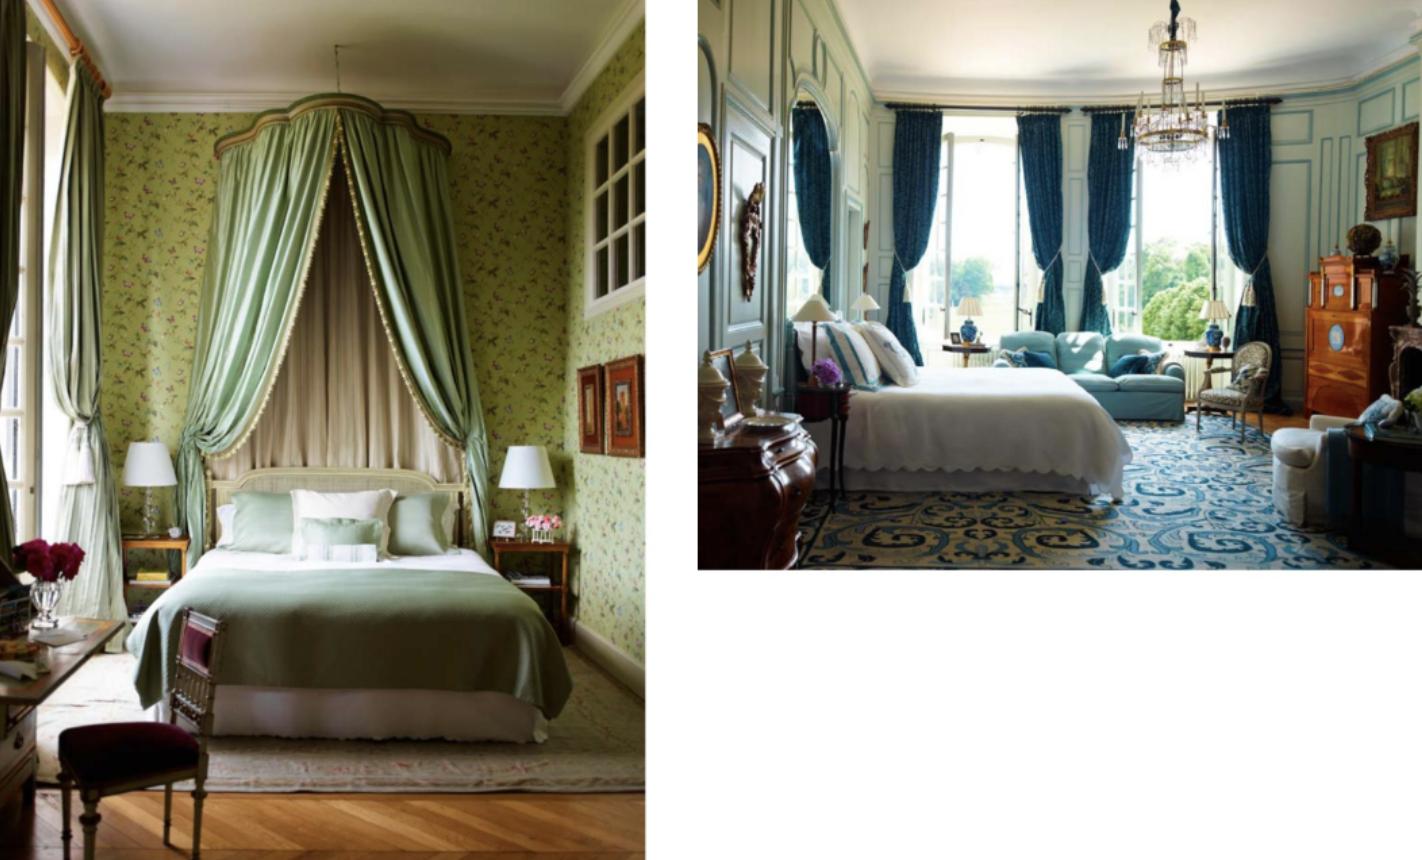 Lovely Bedroom Idea, Deco #bedroom Deco, #bedroom Idea, #lovely Room